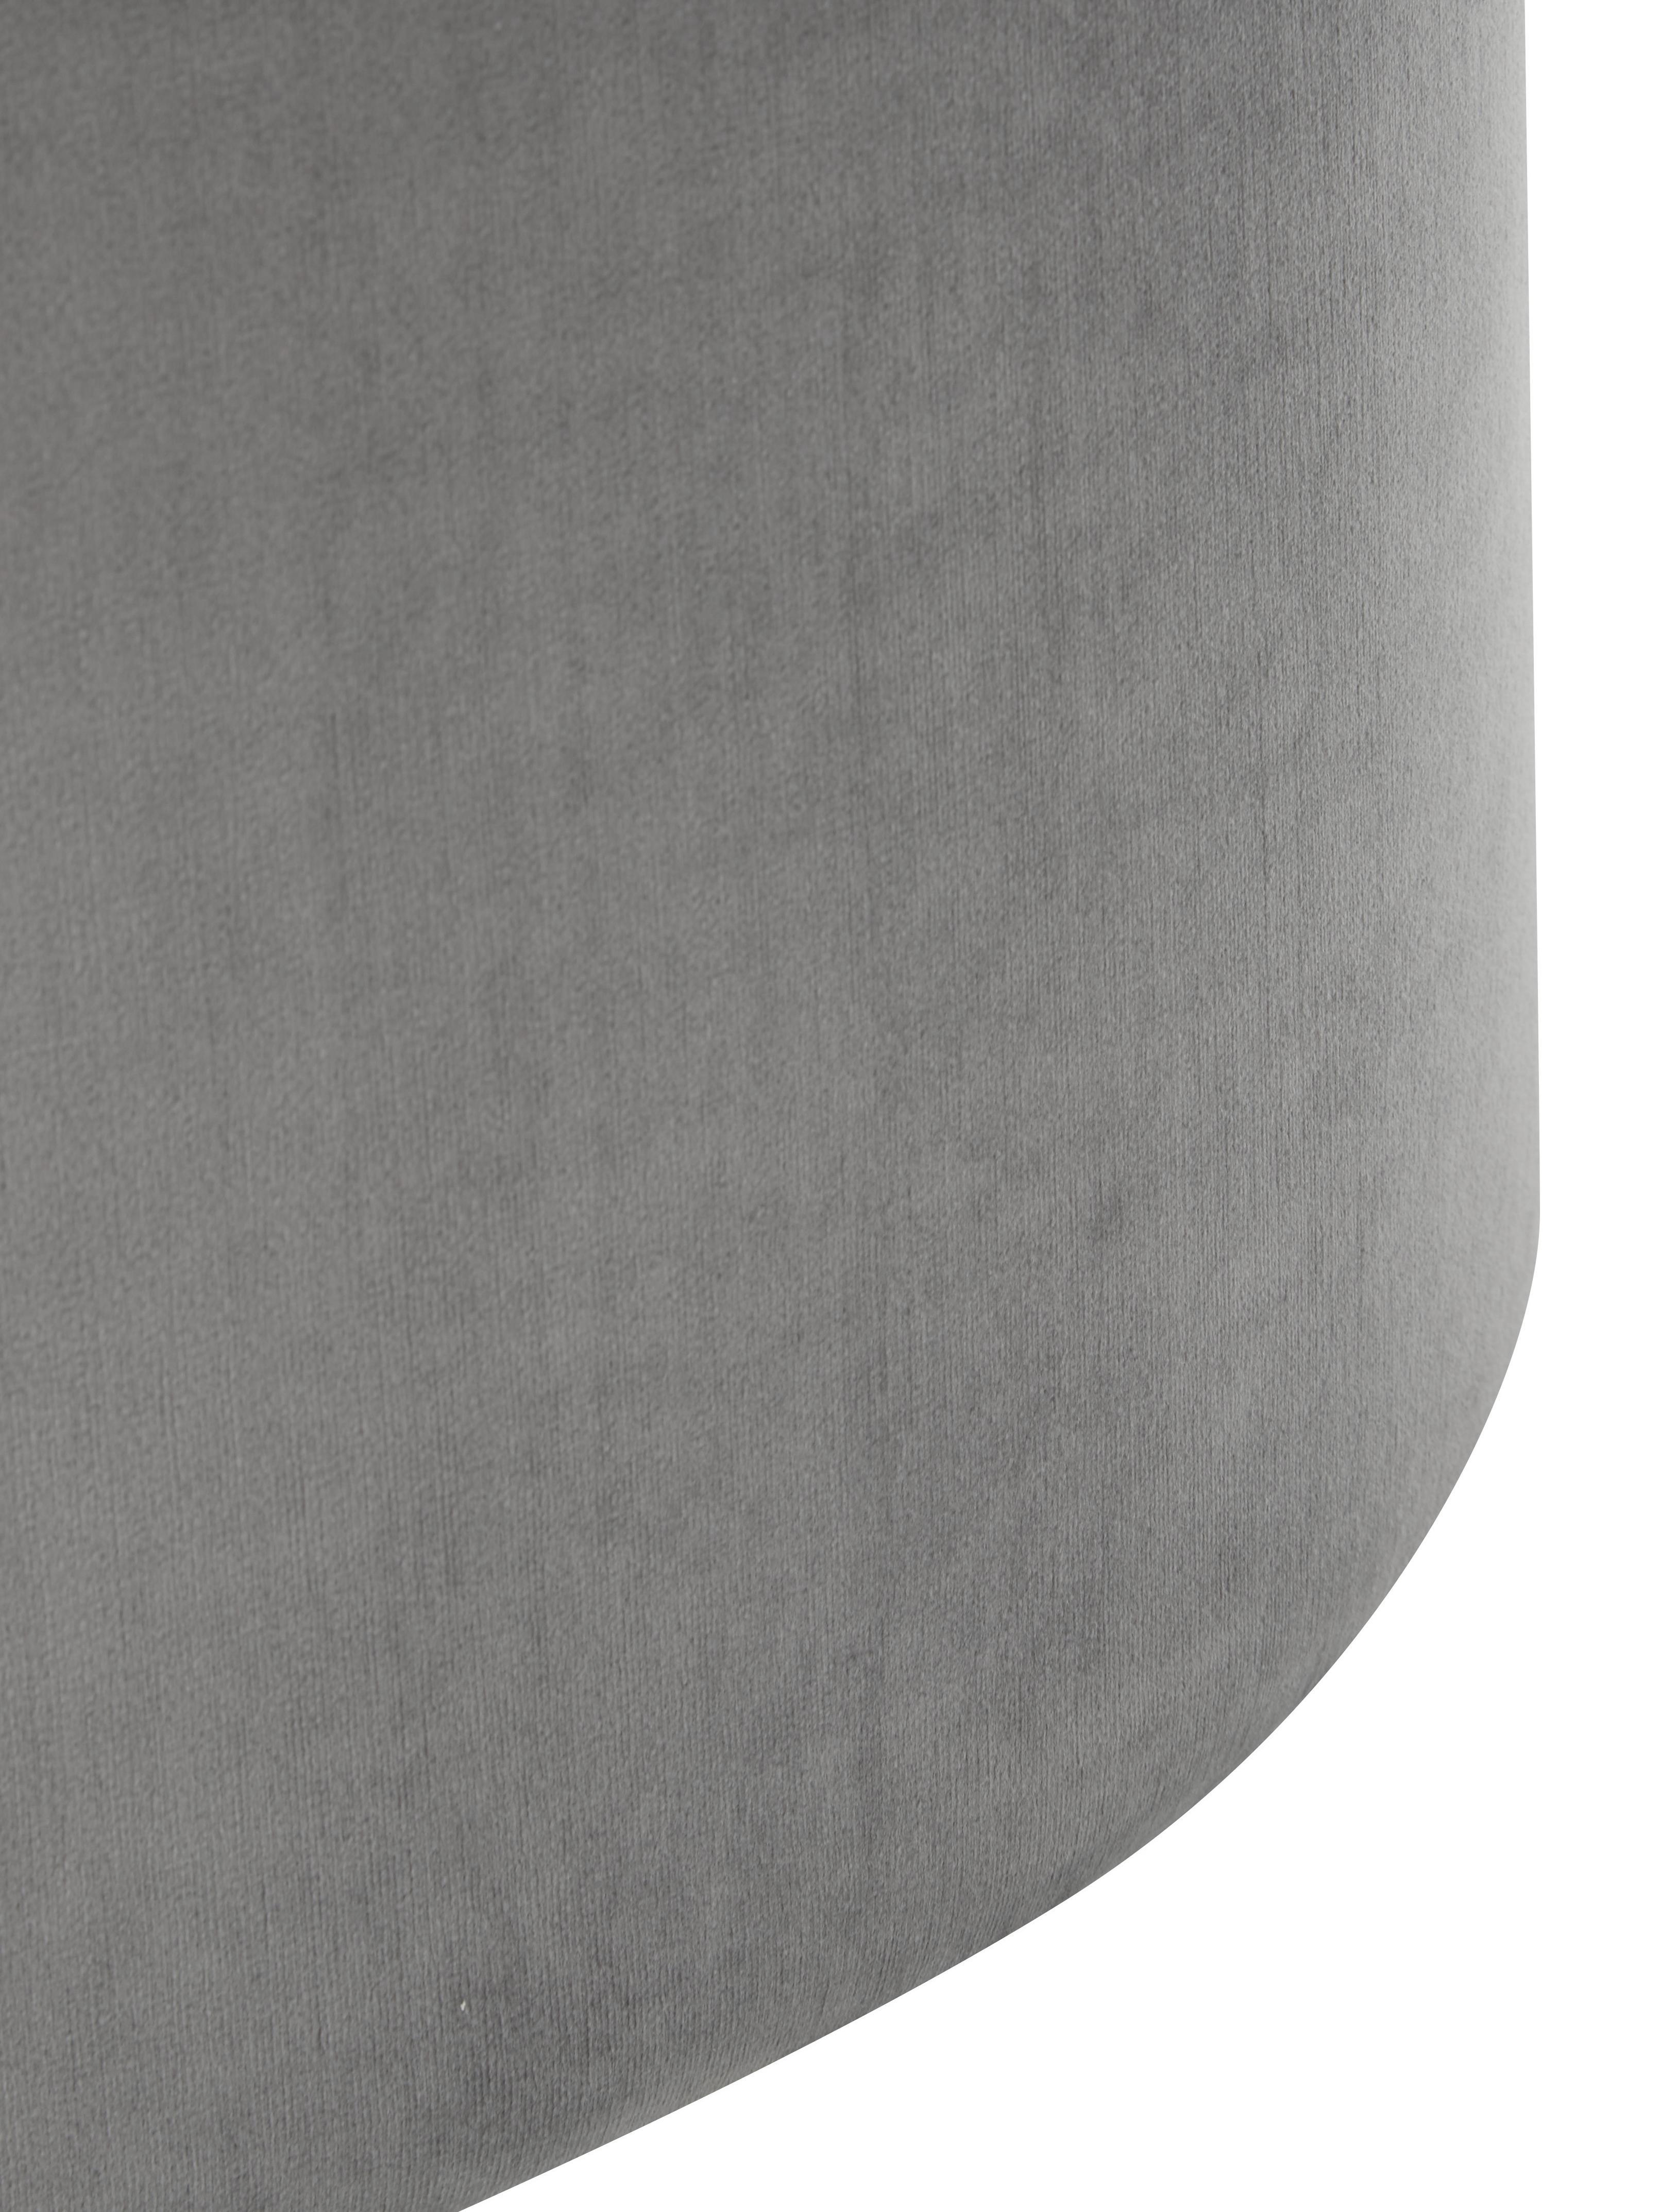 Samt-Hocker Daisy, Bezug: Samt (Polyester) Der hoch, Rahmen: Sperrholz, Samt Grau, Ø 54 x H 40 cm